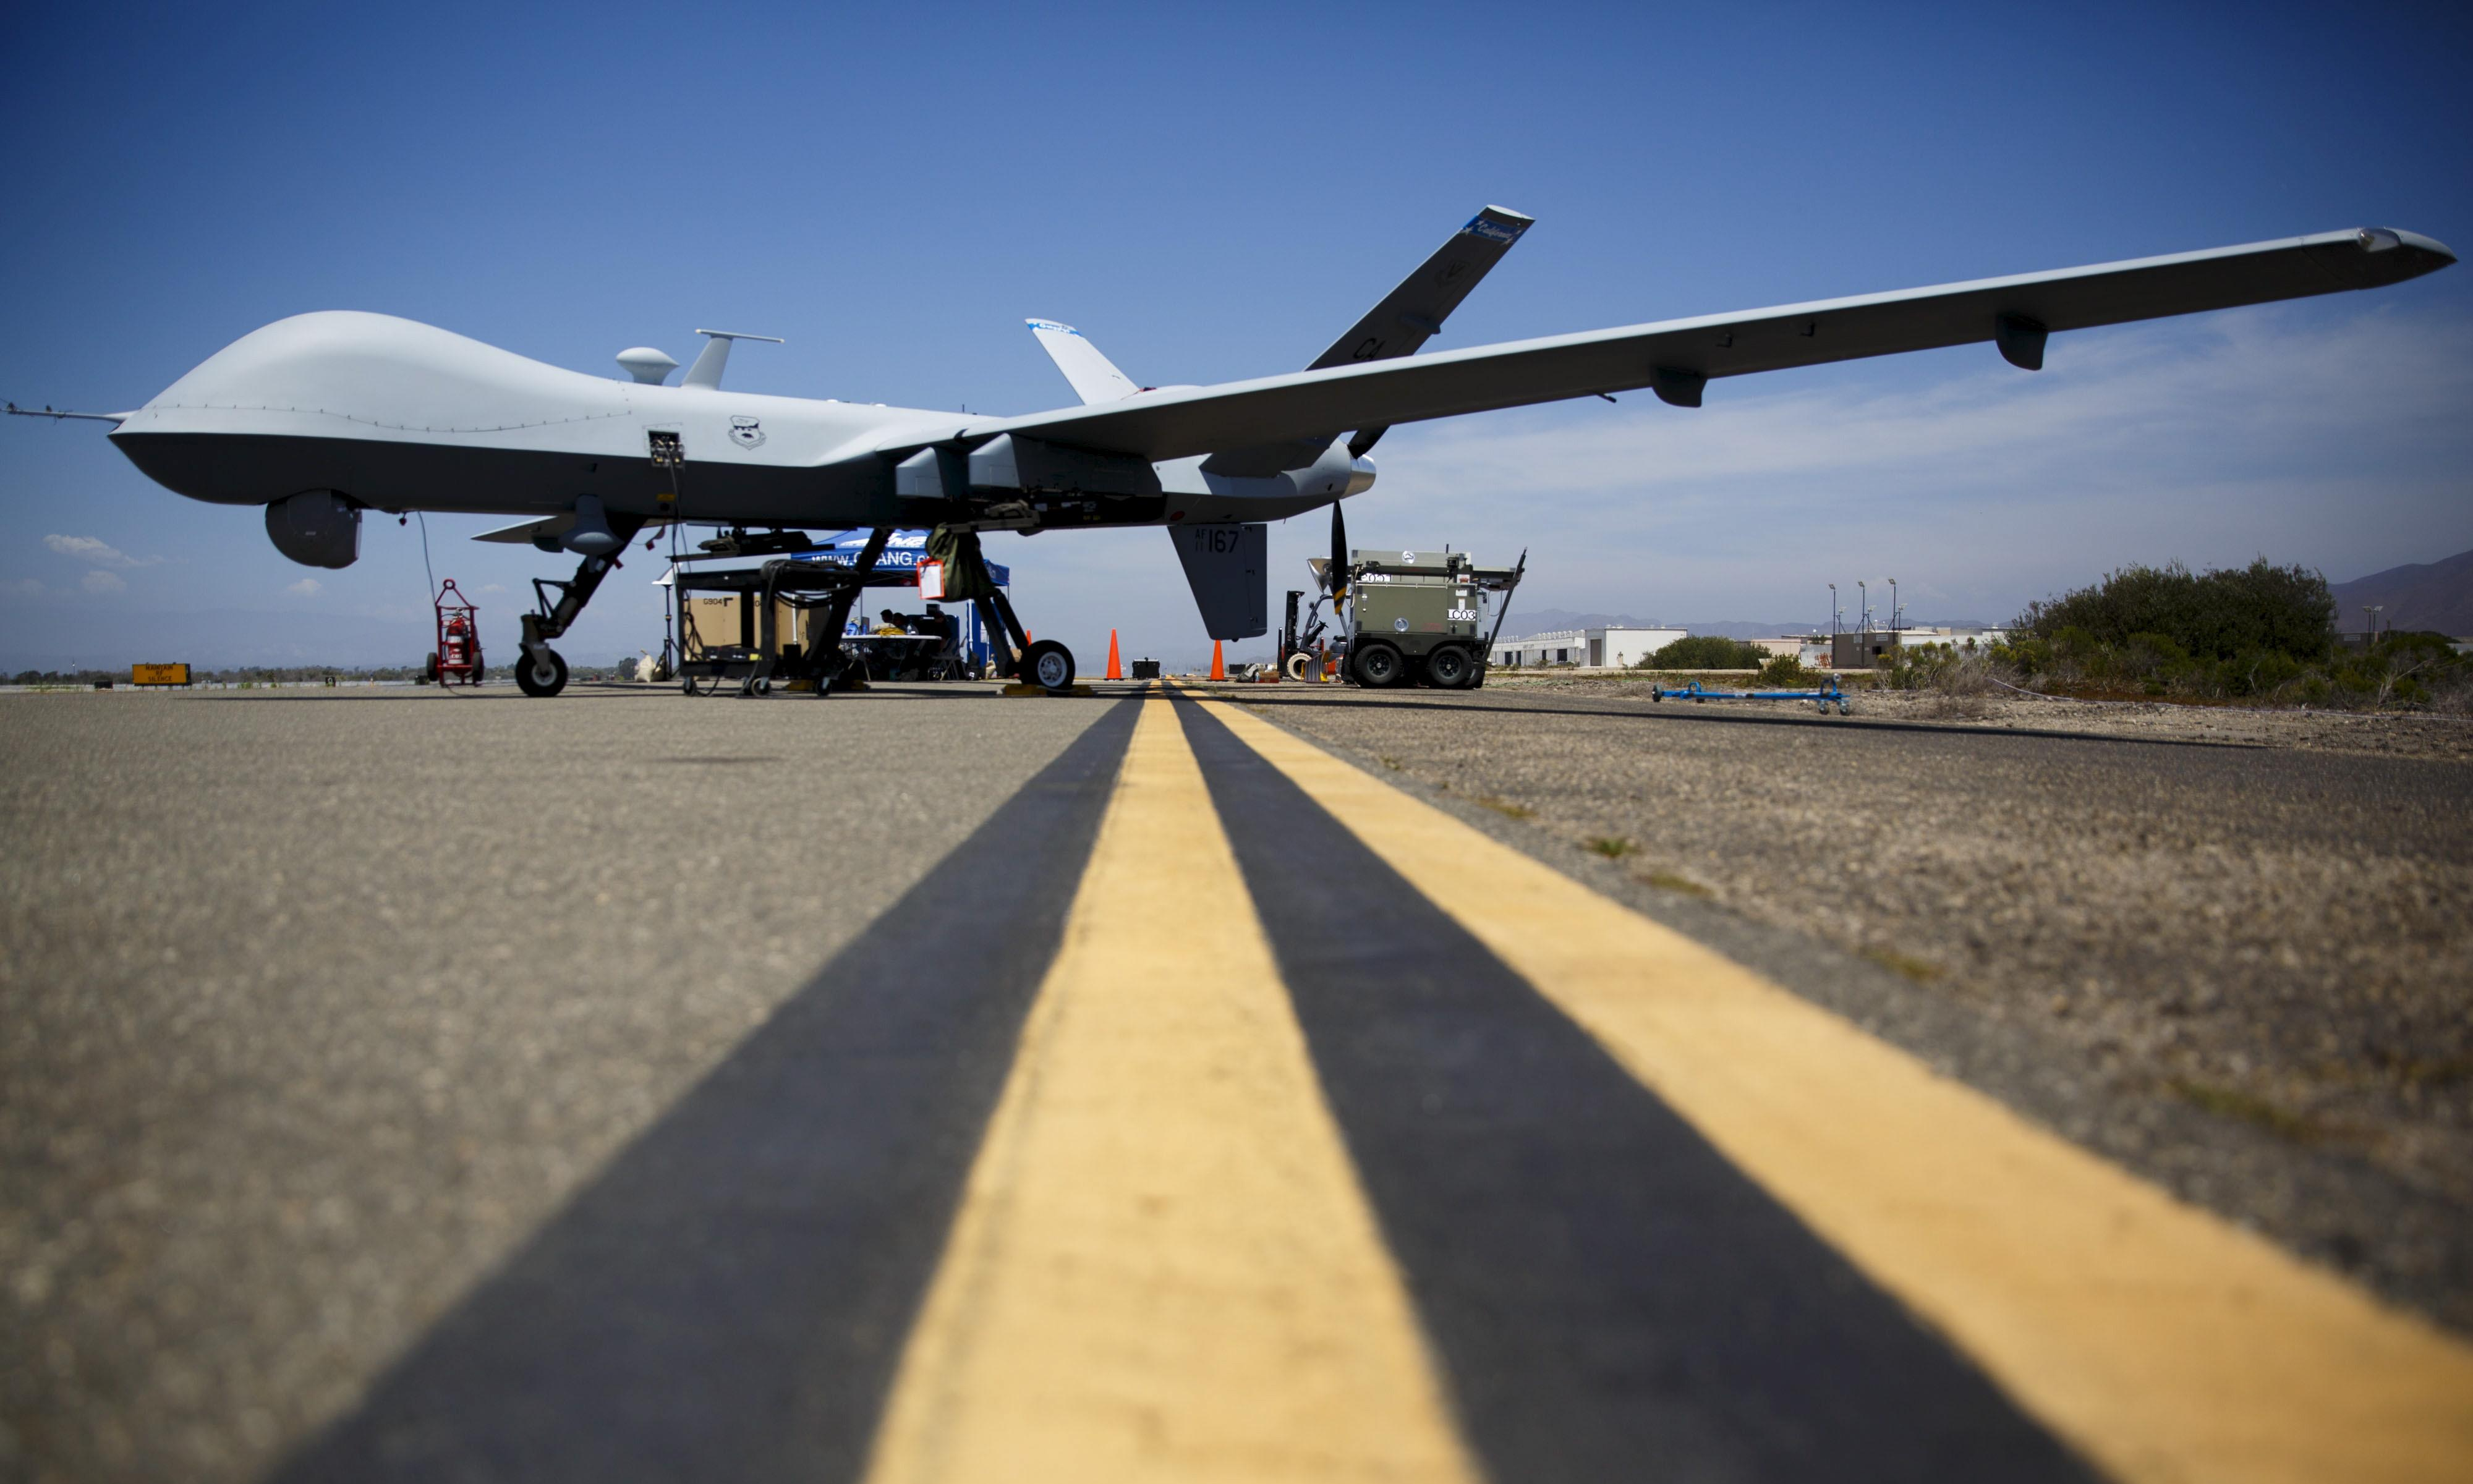 Snowden and Ellsberg hail leak of drone documents from new whistleblower